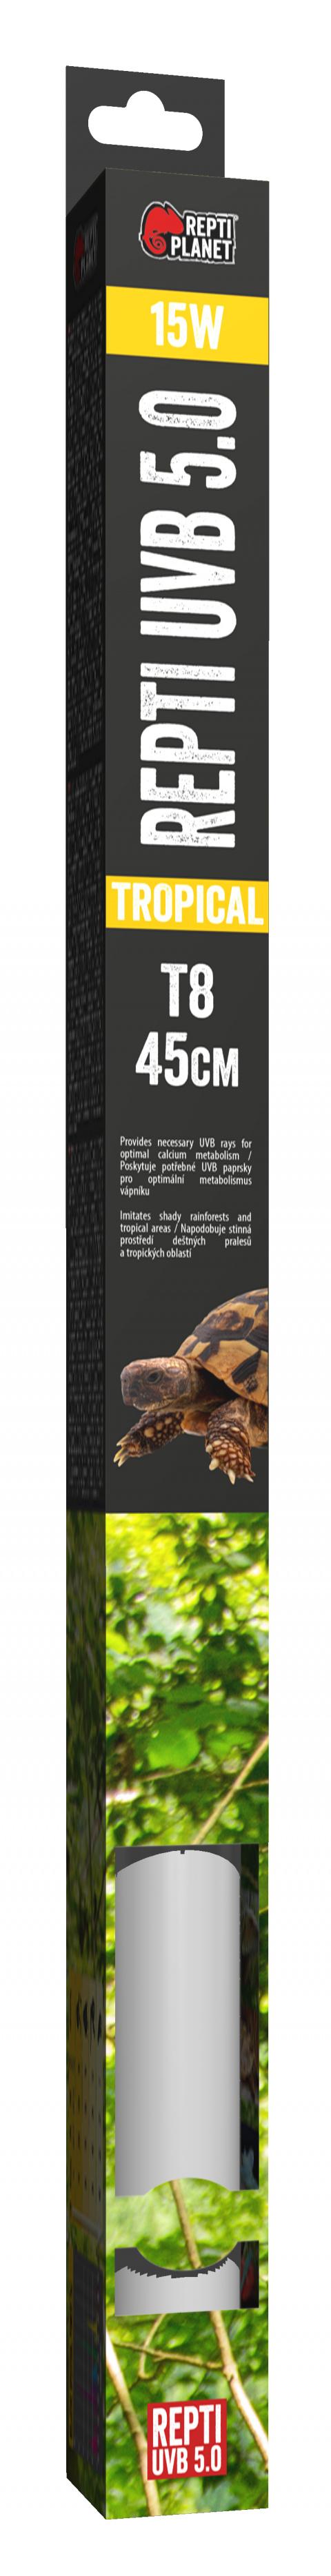 Лампа для террариумов - ReptiPlanet Repti T8 UVB 5.0 15W, 45 см title=